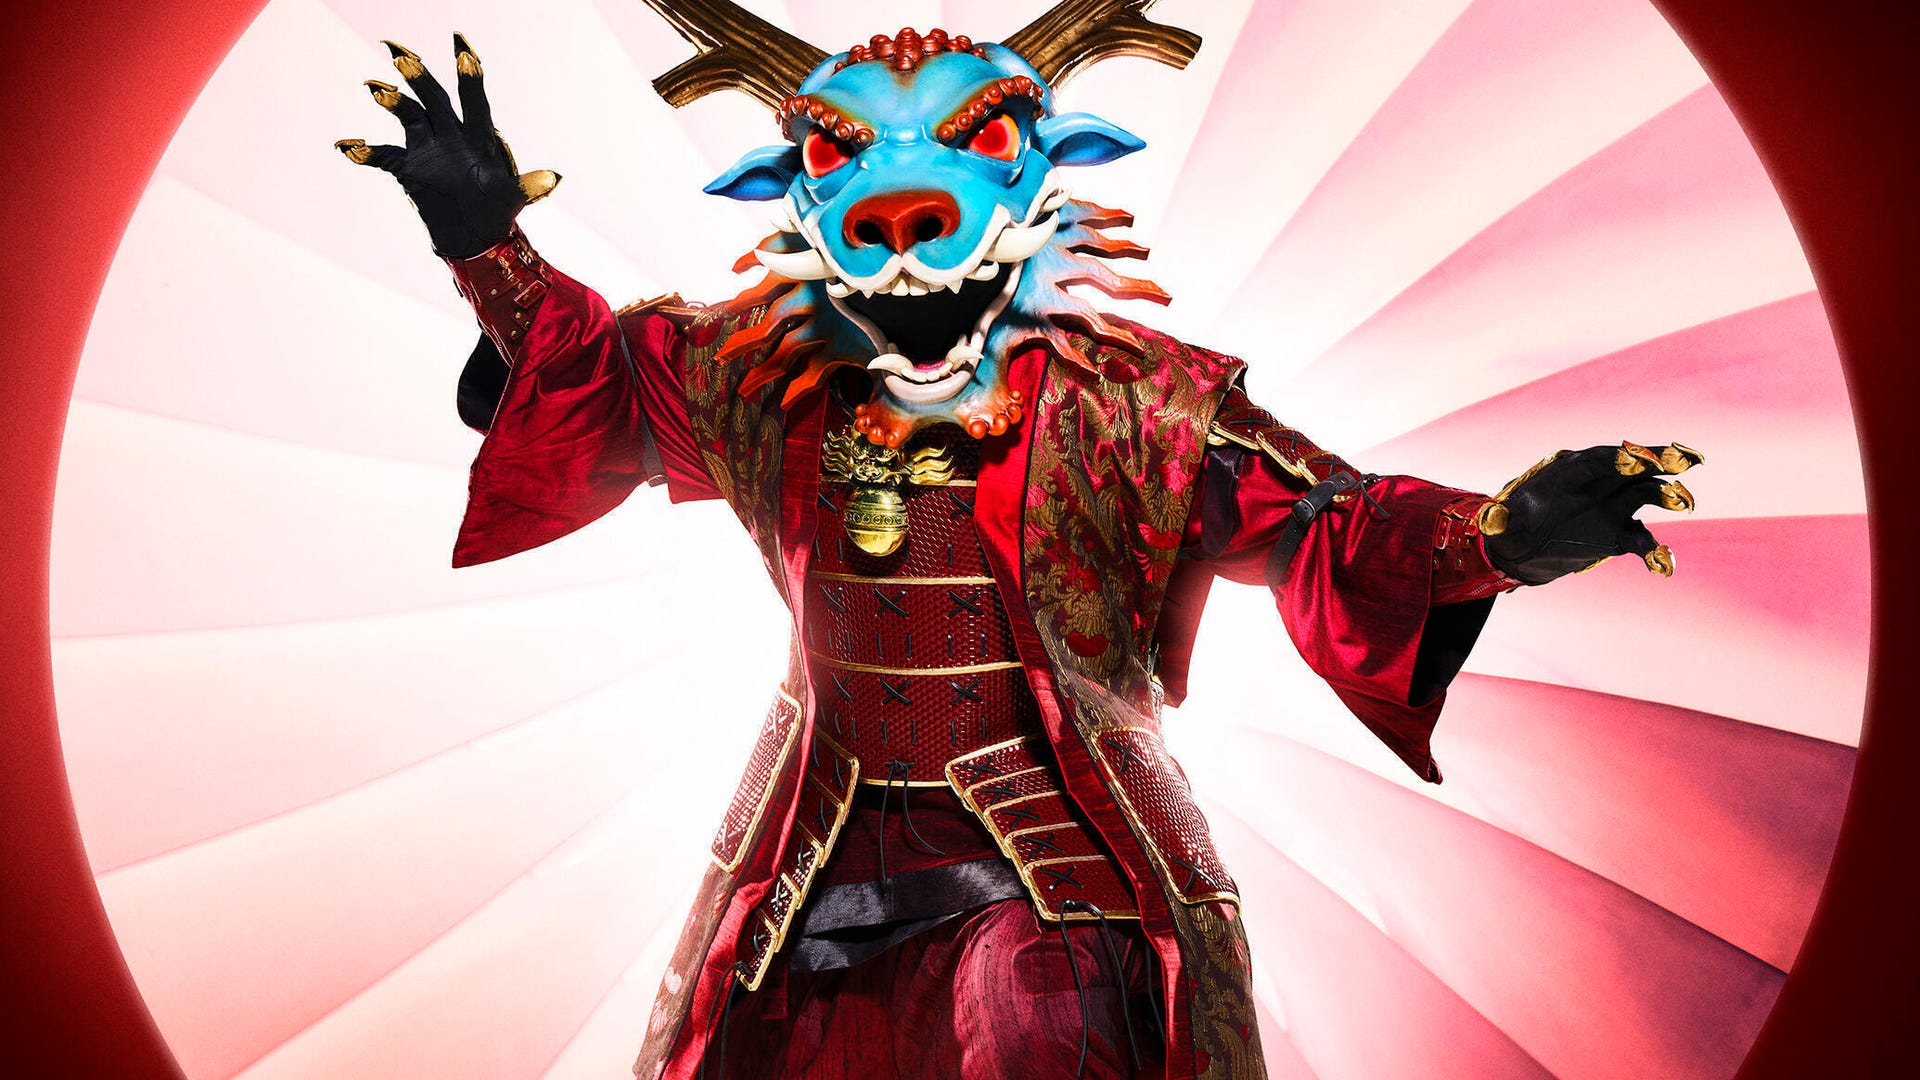 Dragon, The Masked Singer